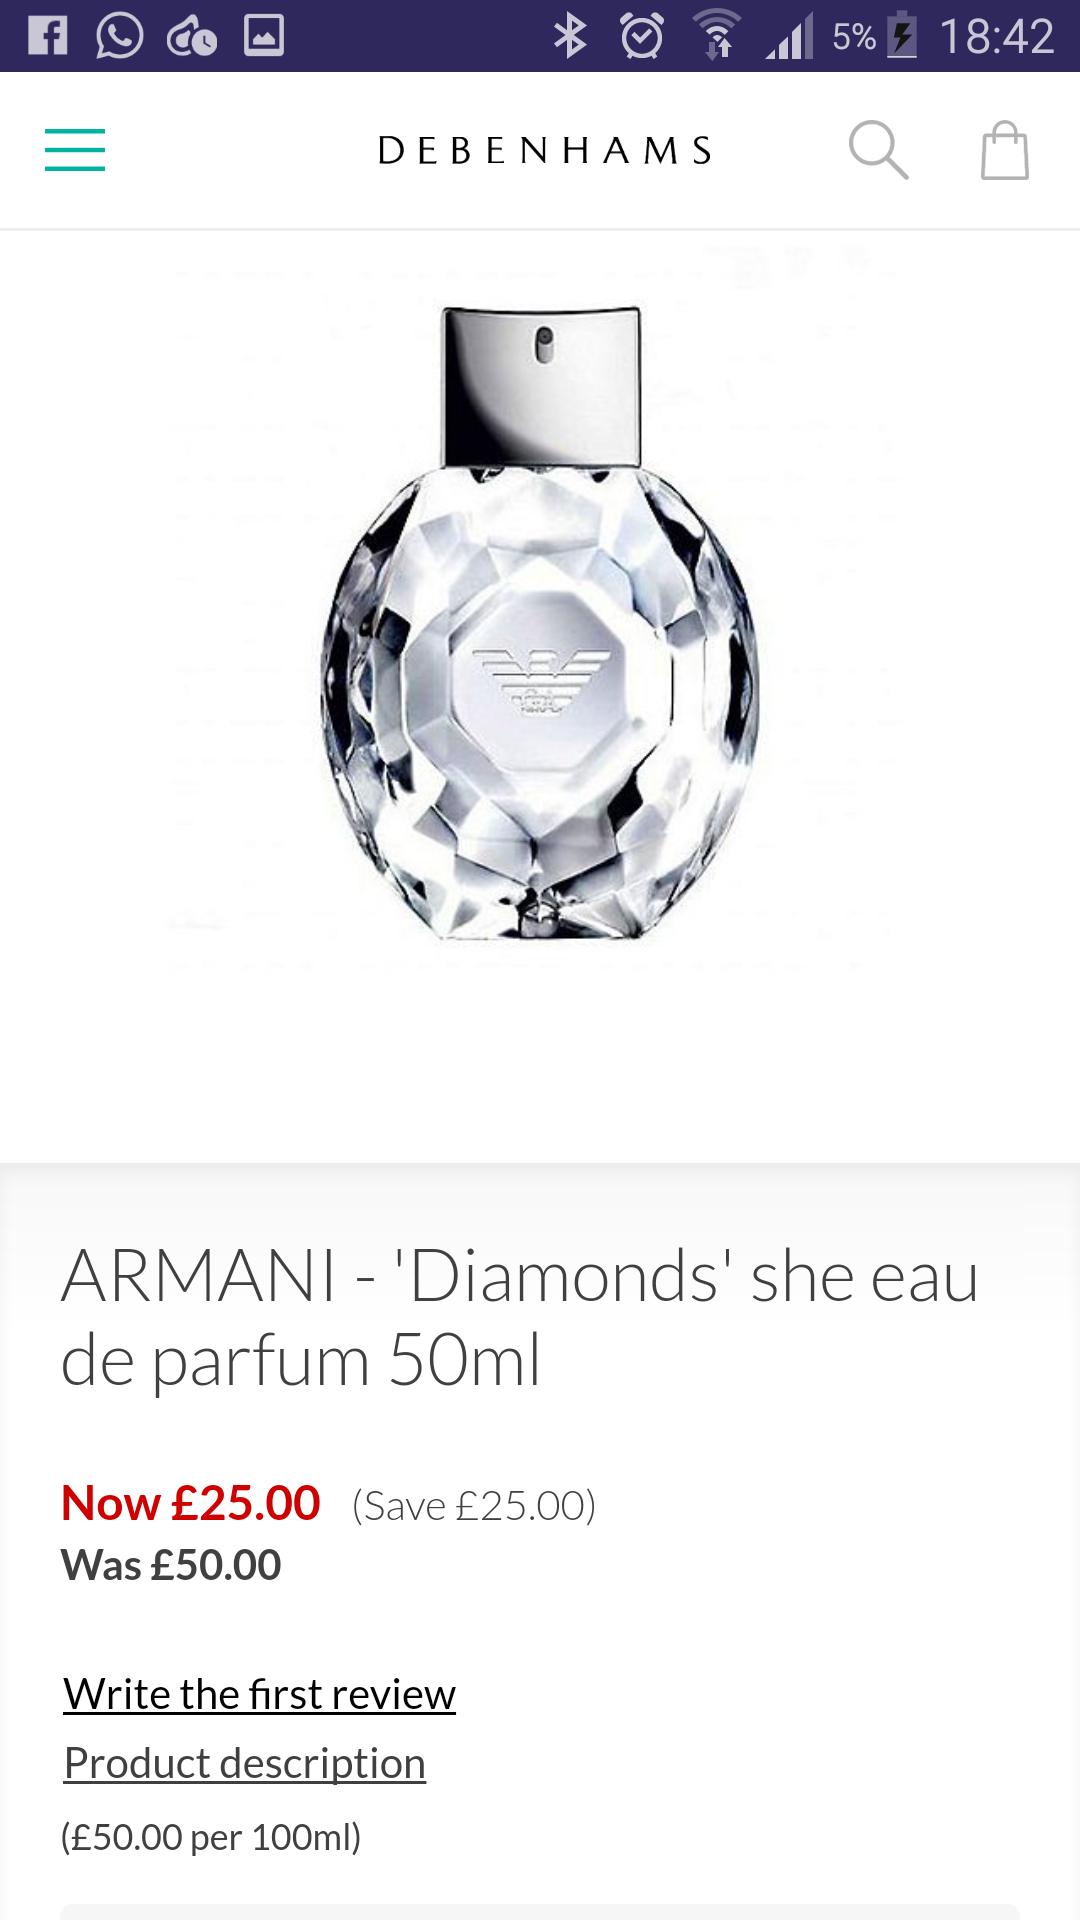 ARMANI - 'Diamonds' she eau de parfum 50ml £25 @ Debenhams - Free c&c